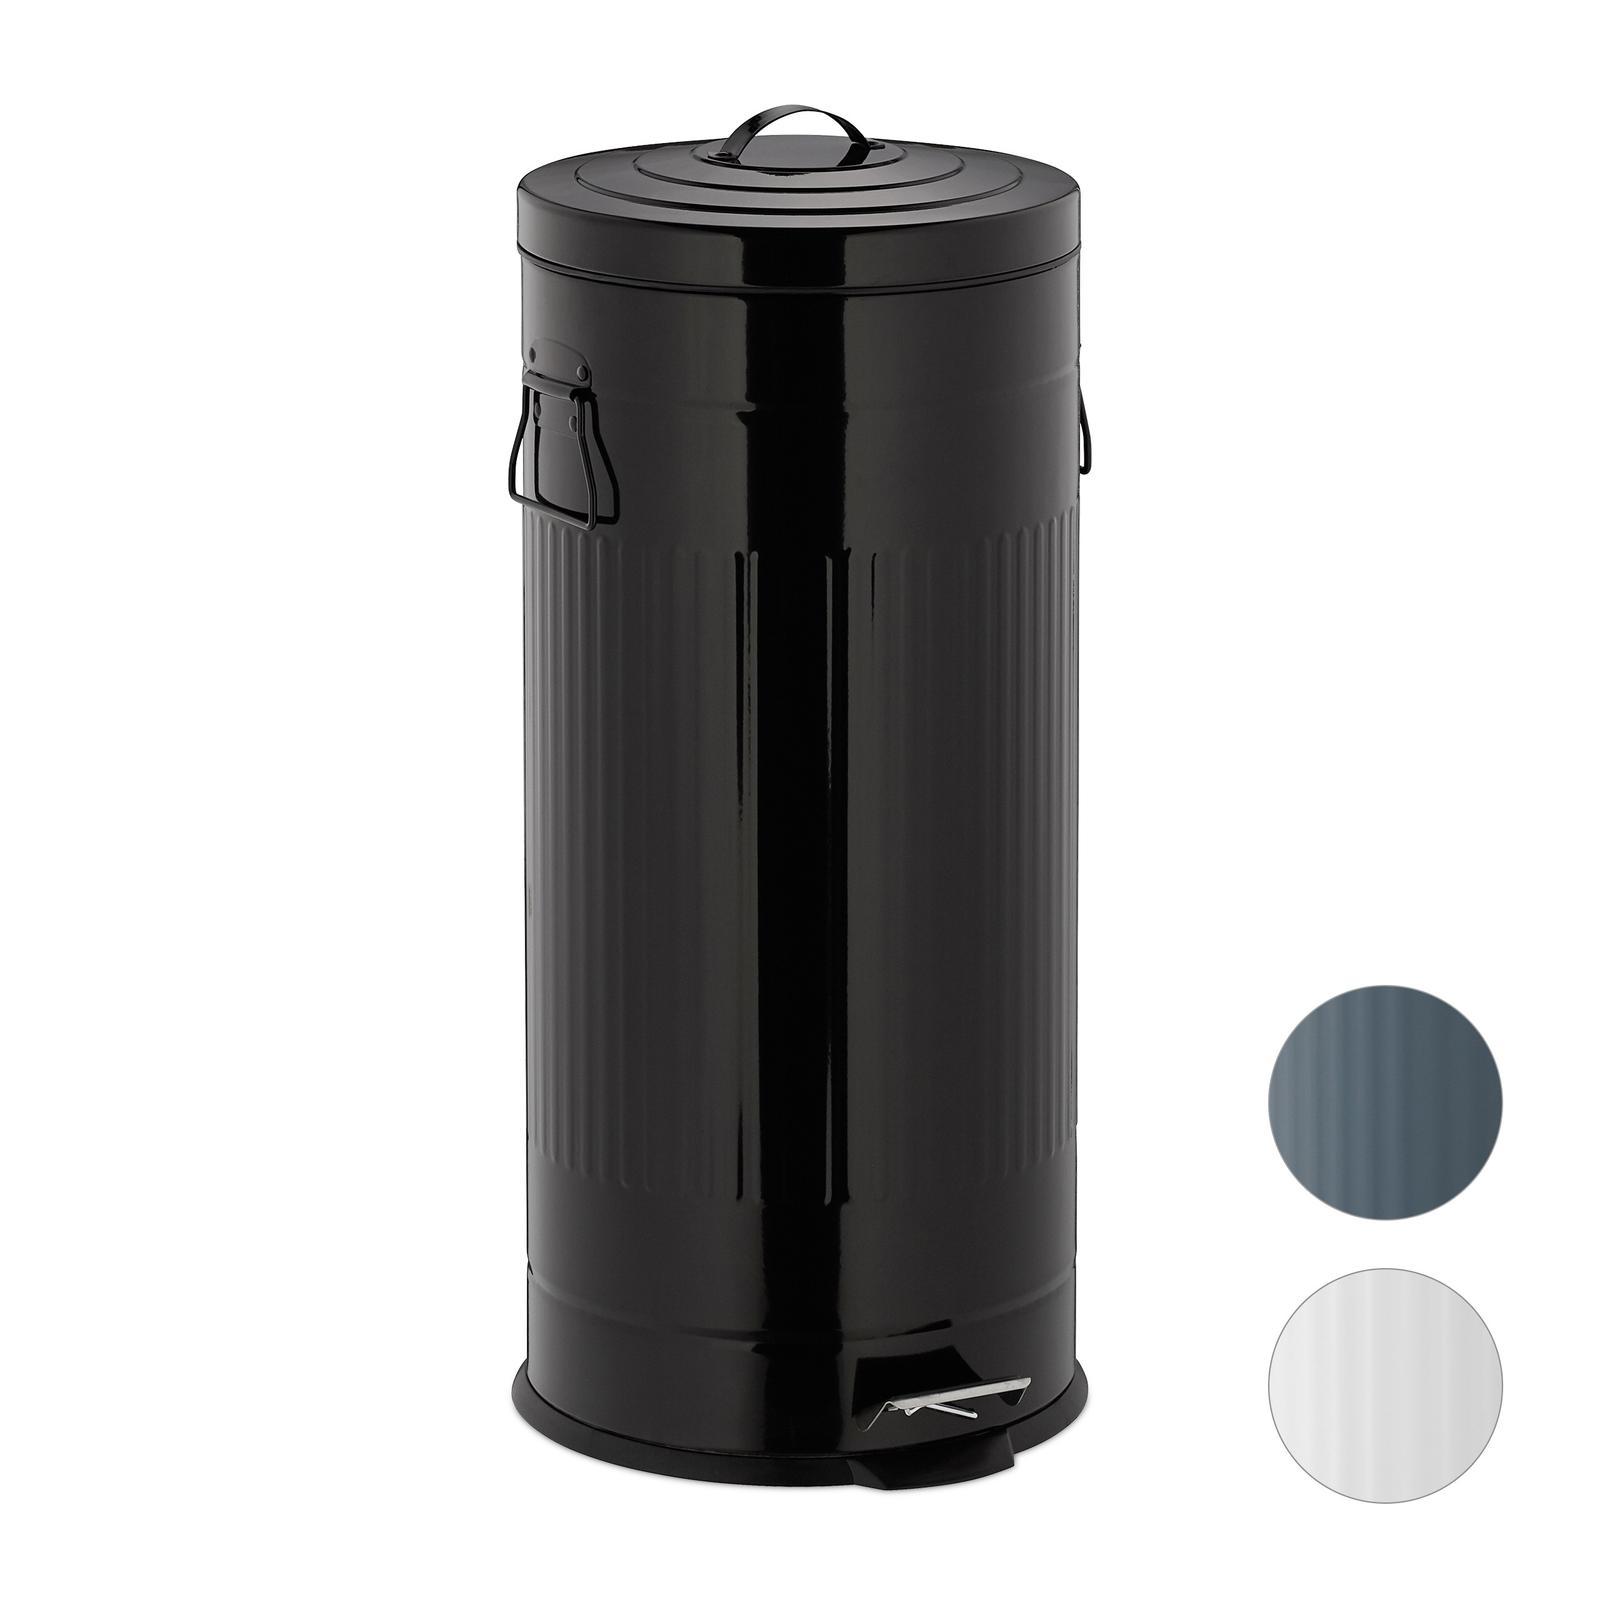 Odpadkový kôš 30L čierny Vintage, RD5614 - Obrázok č. 1